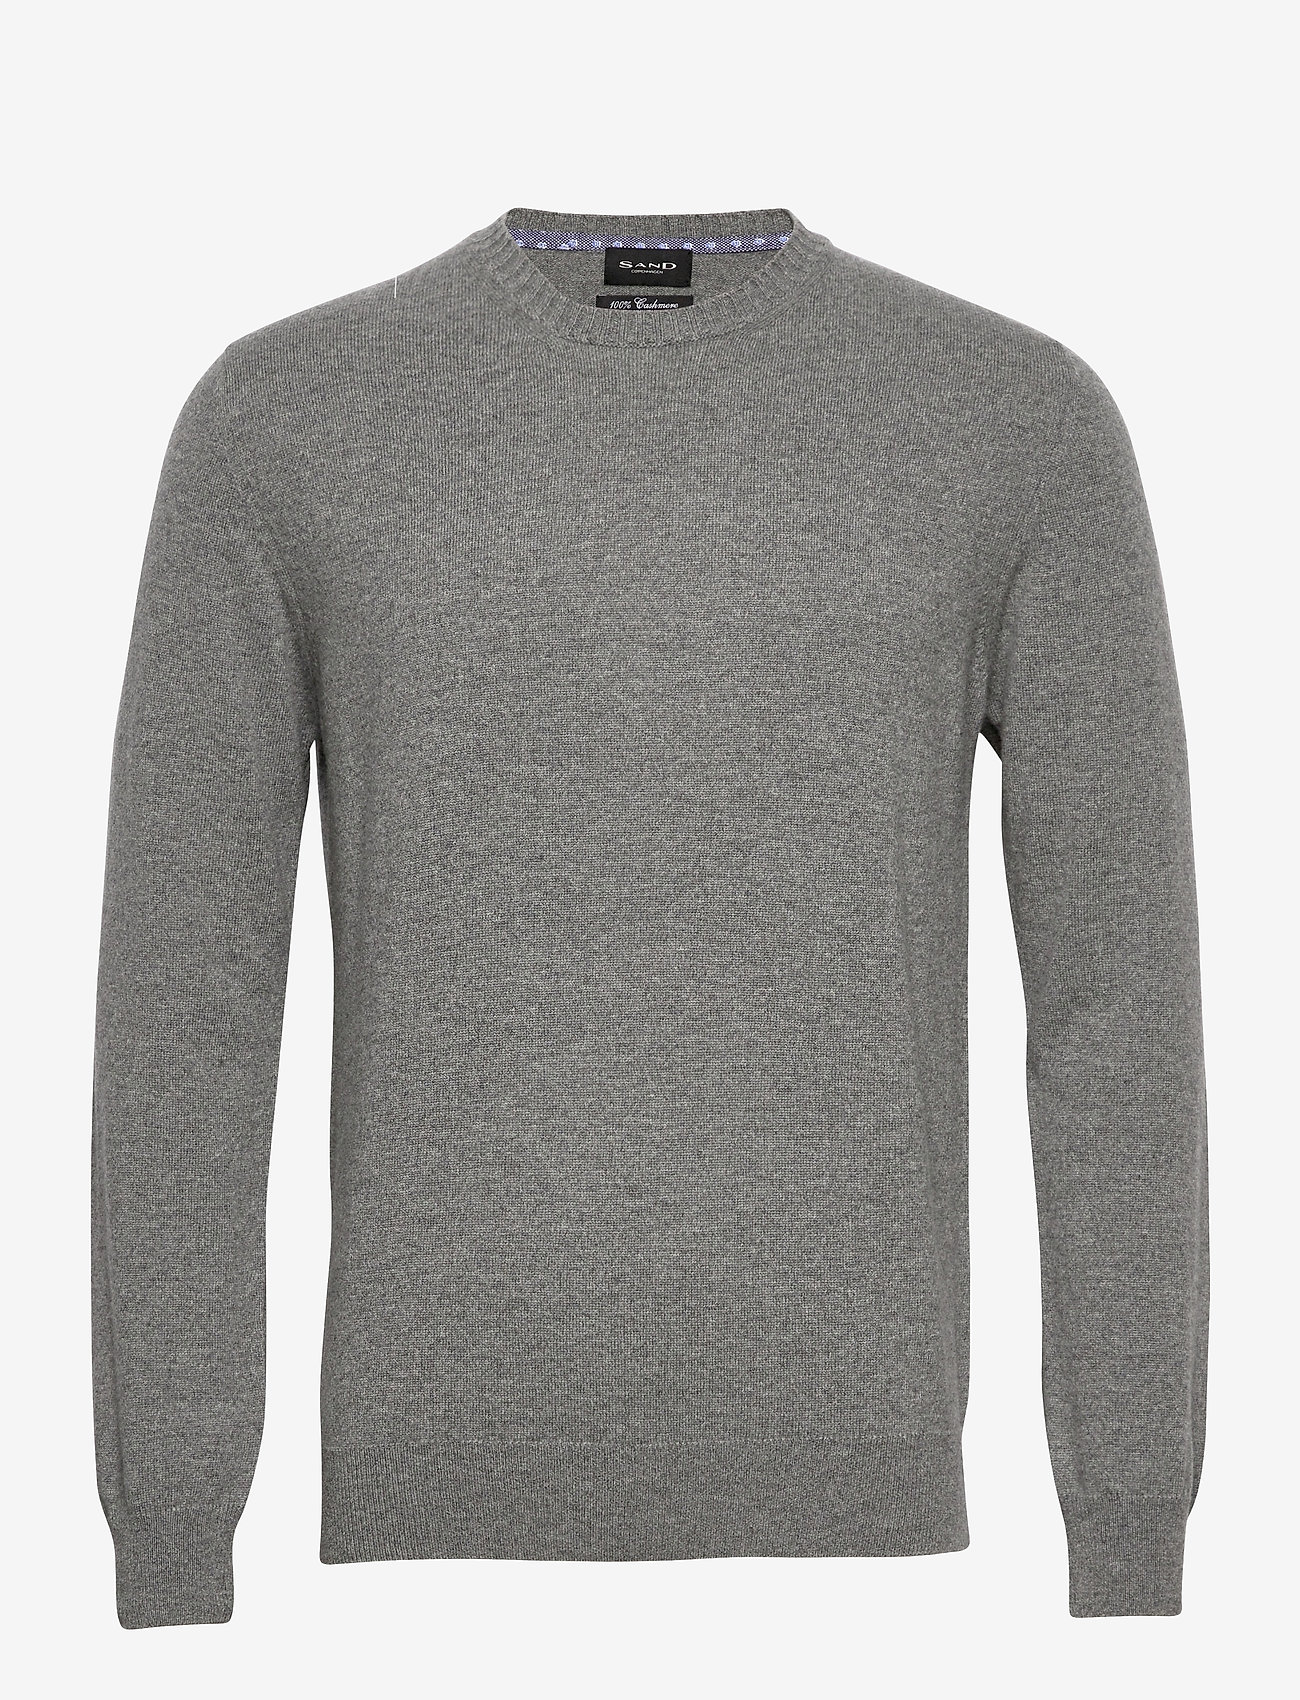 SAND - Cashmere - Iq - basic strik - grey - 0